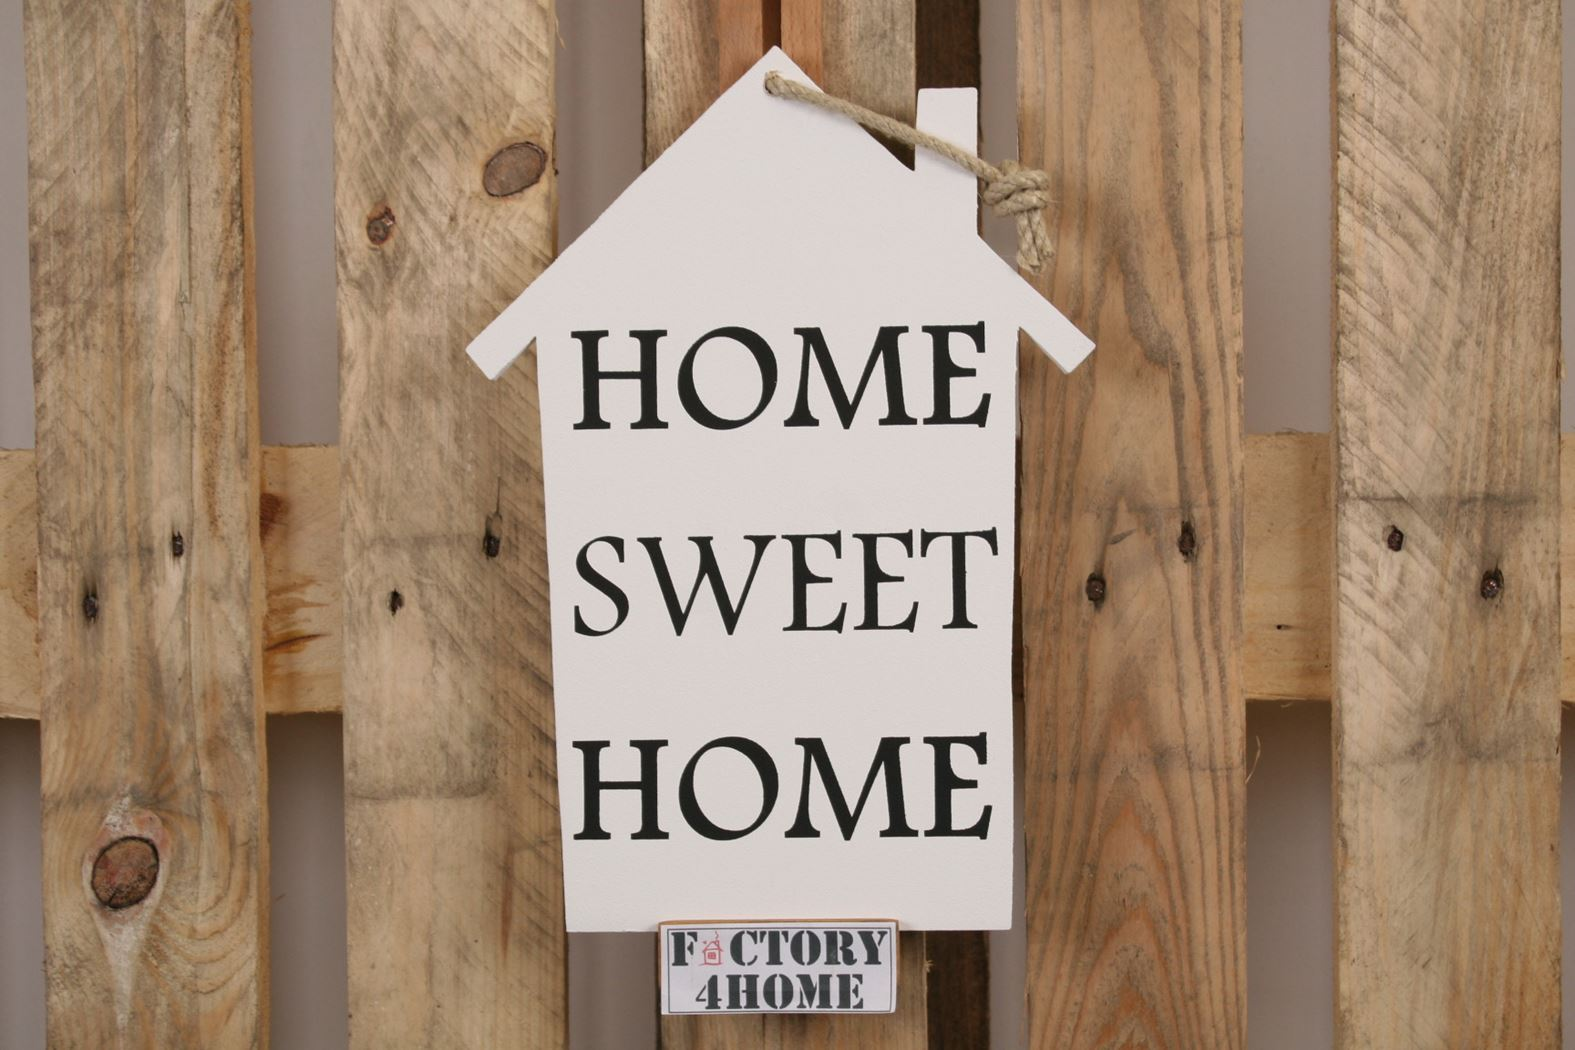 spreukbord huisje white - home sweet home